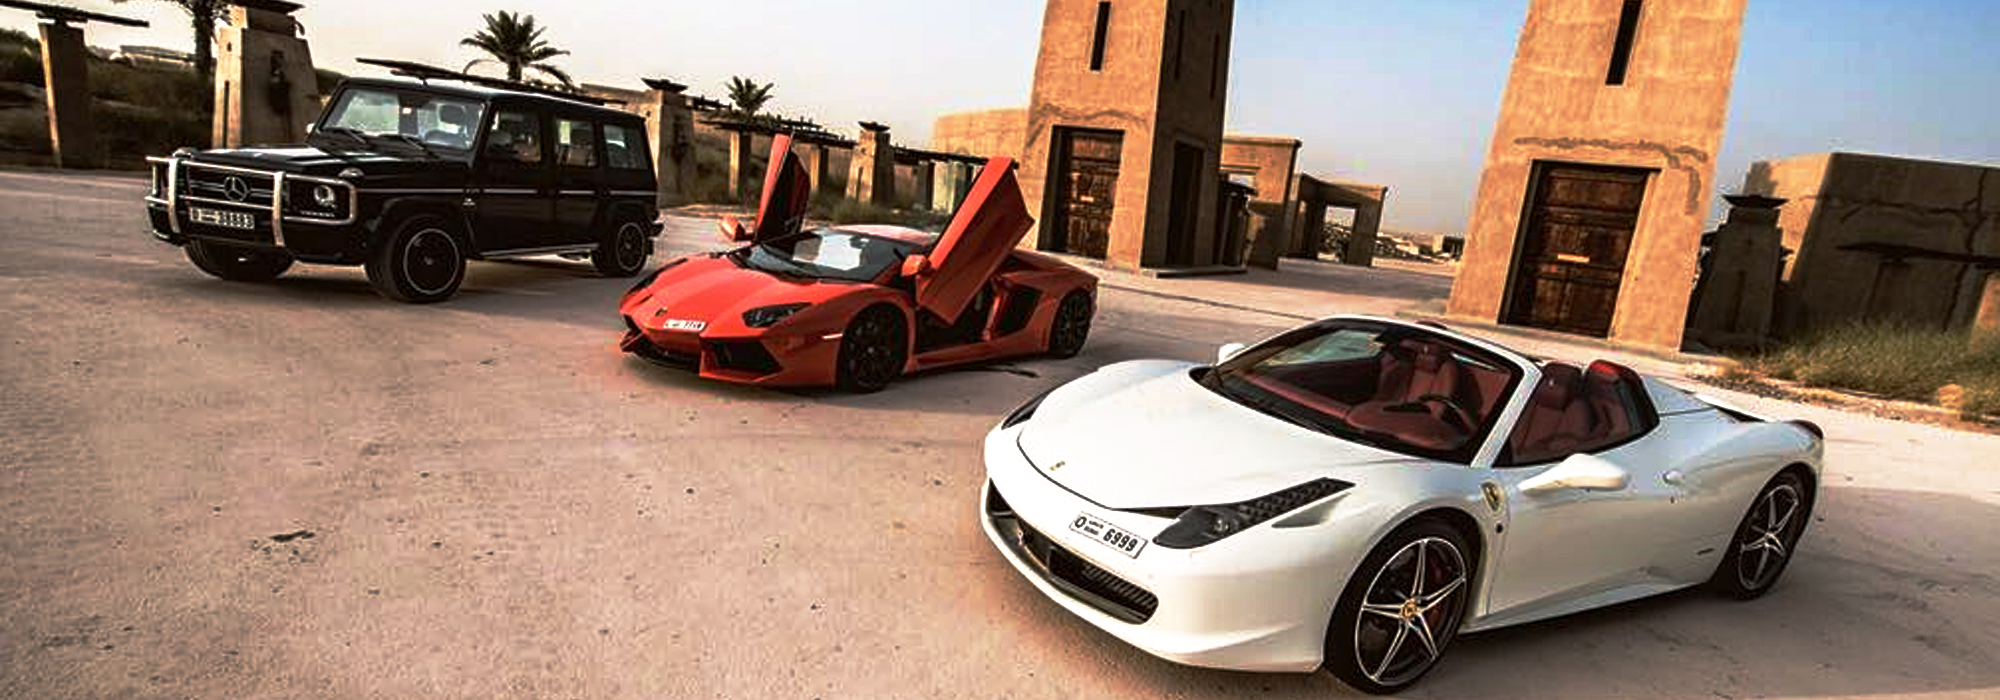 car luxury dubai  Masterkey Luxury Car Rental Dubai – UAE